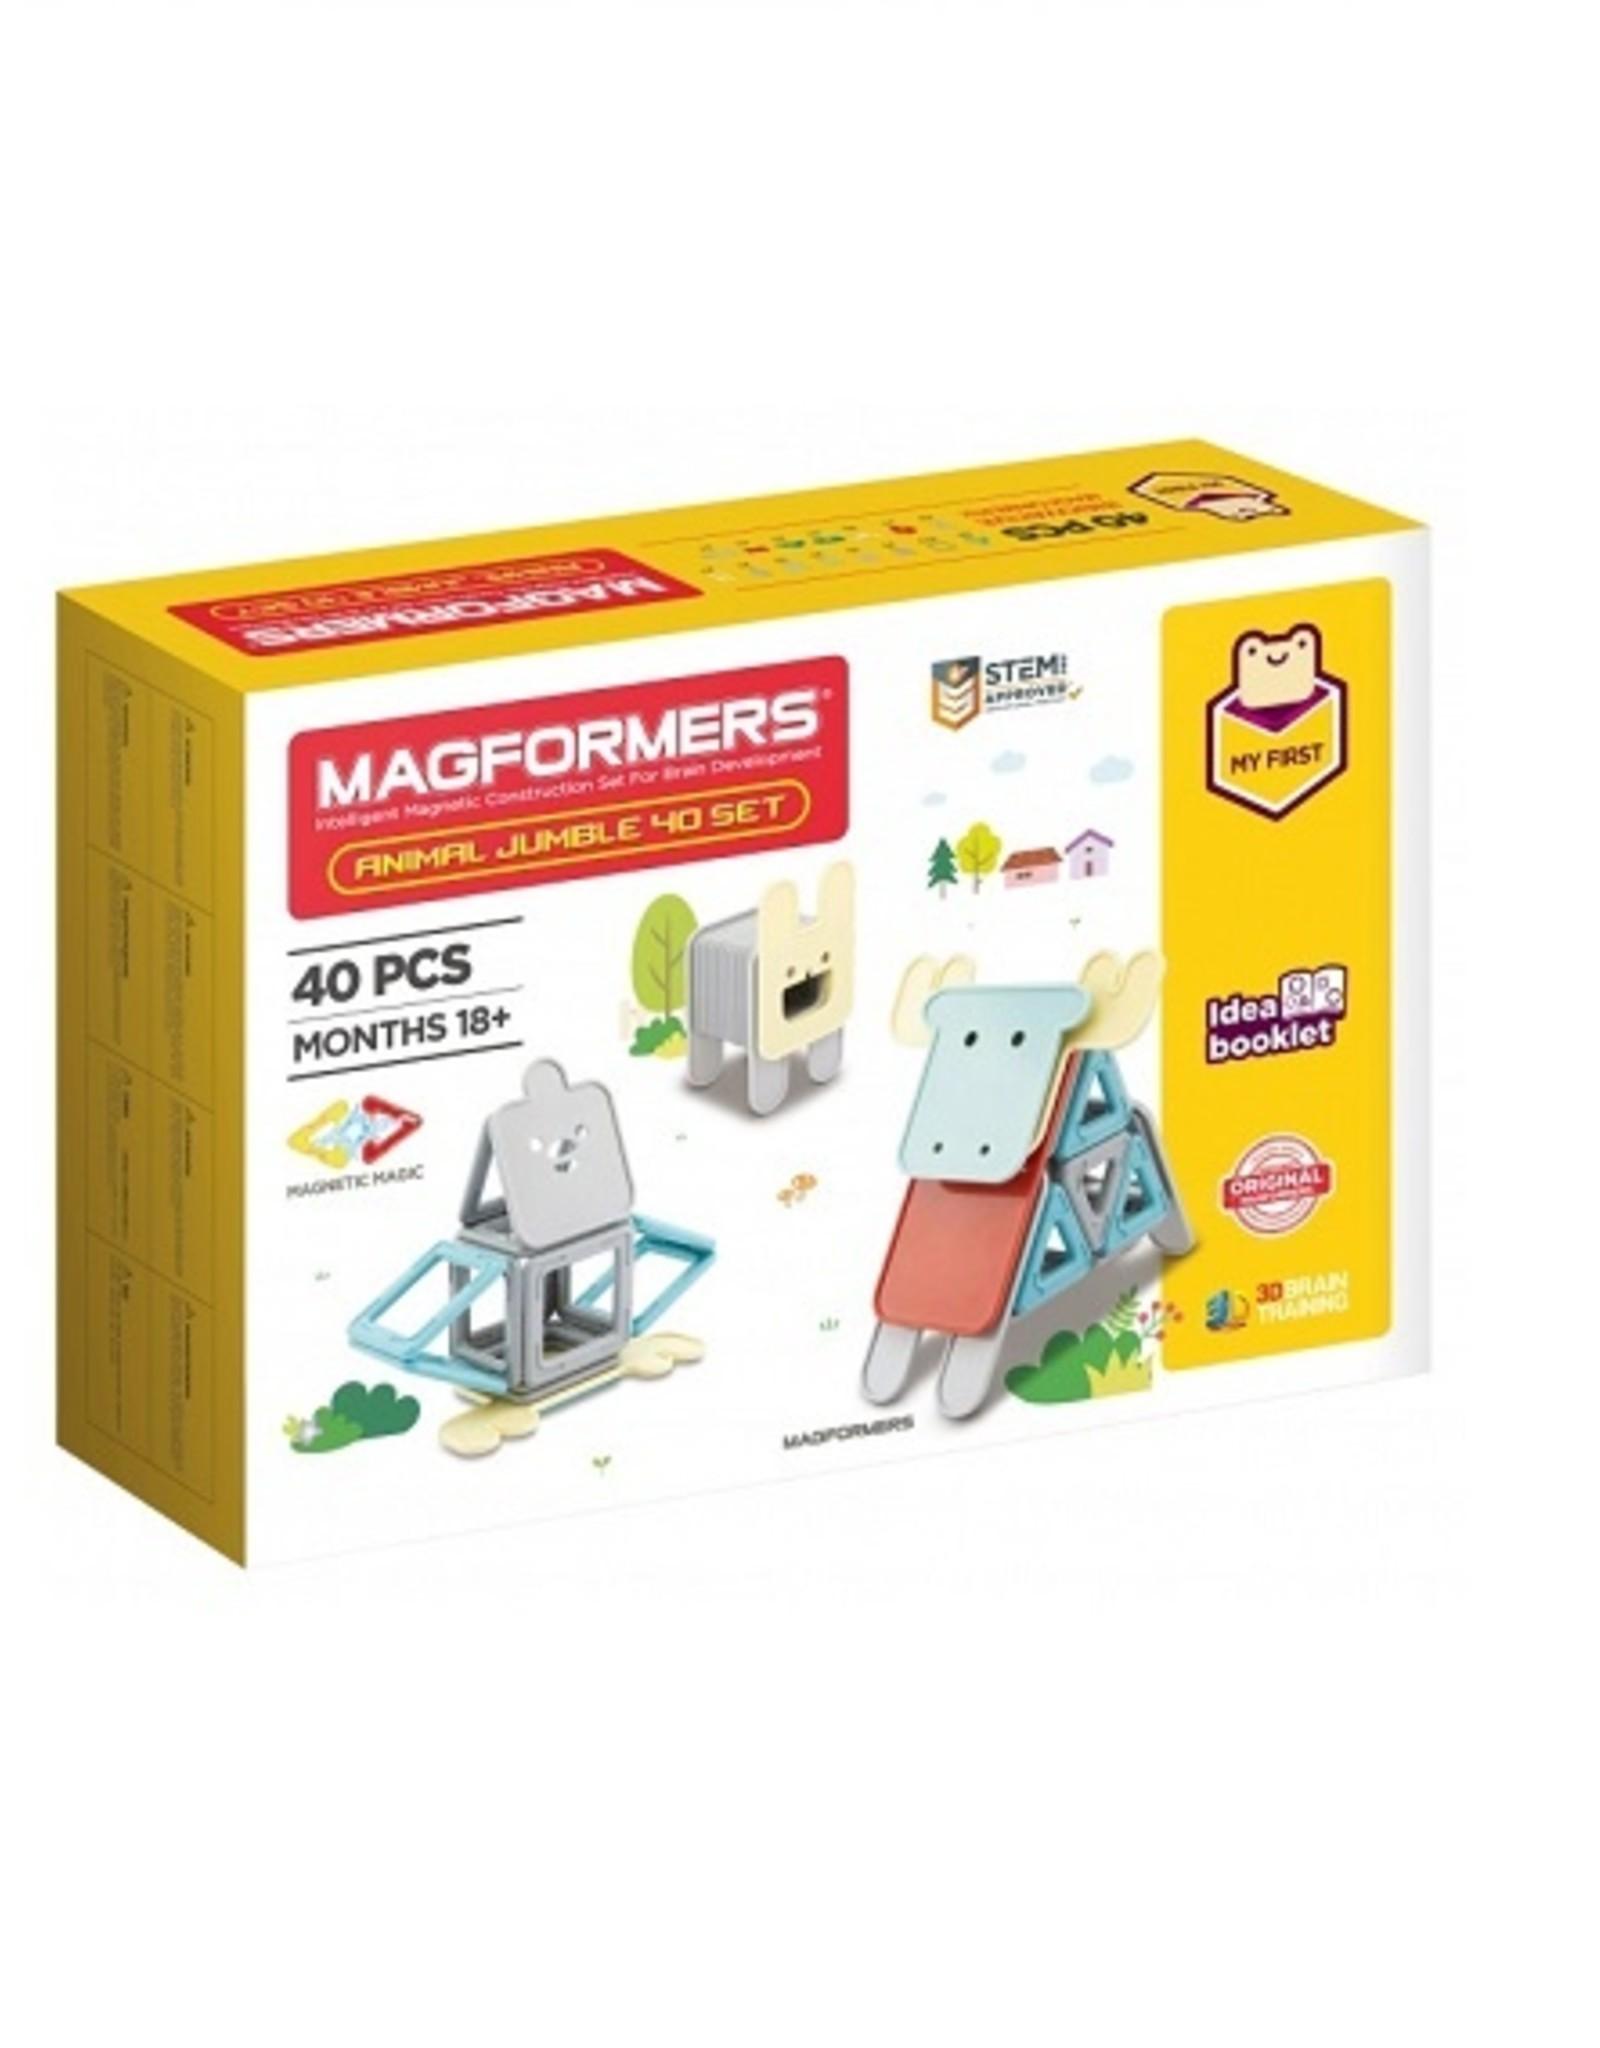 Magformers Animal Jumble 40 set